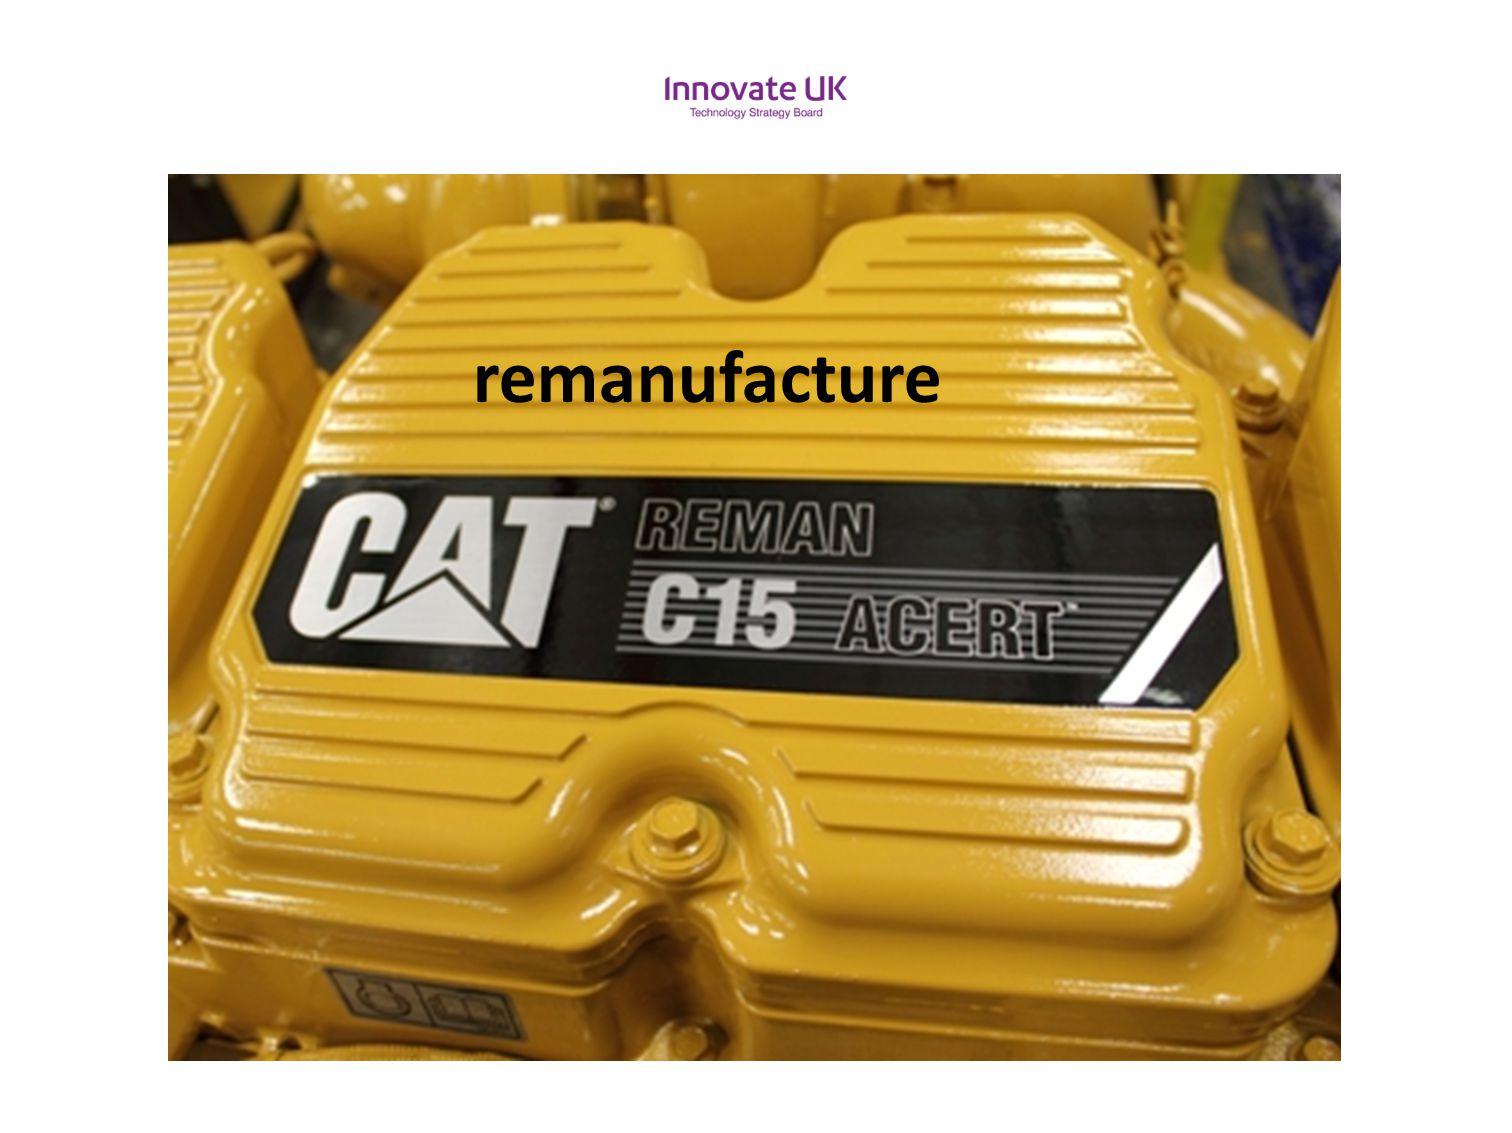 remanufacture